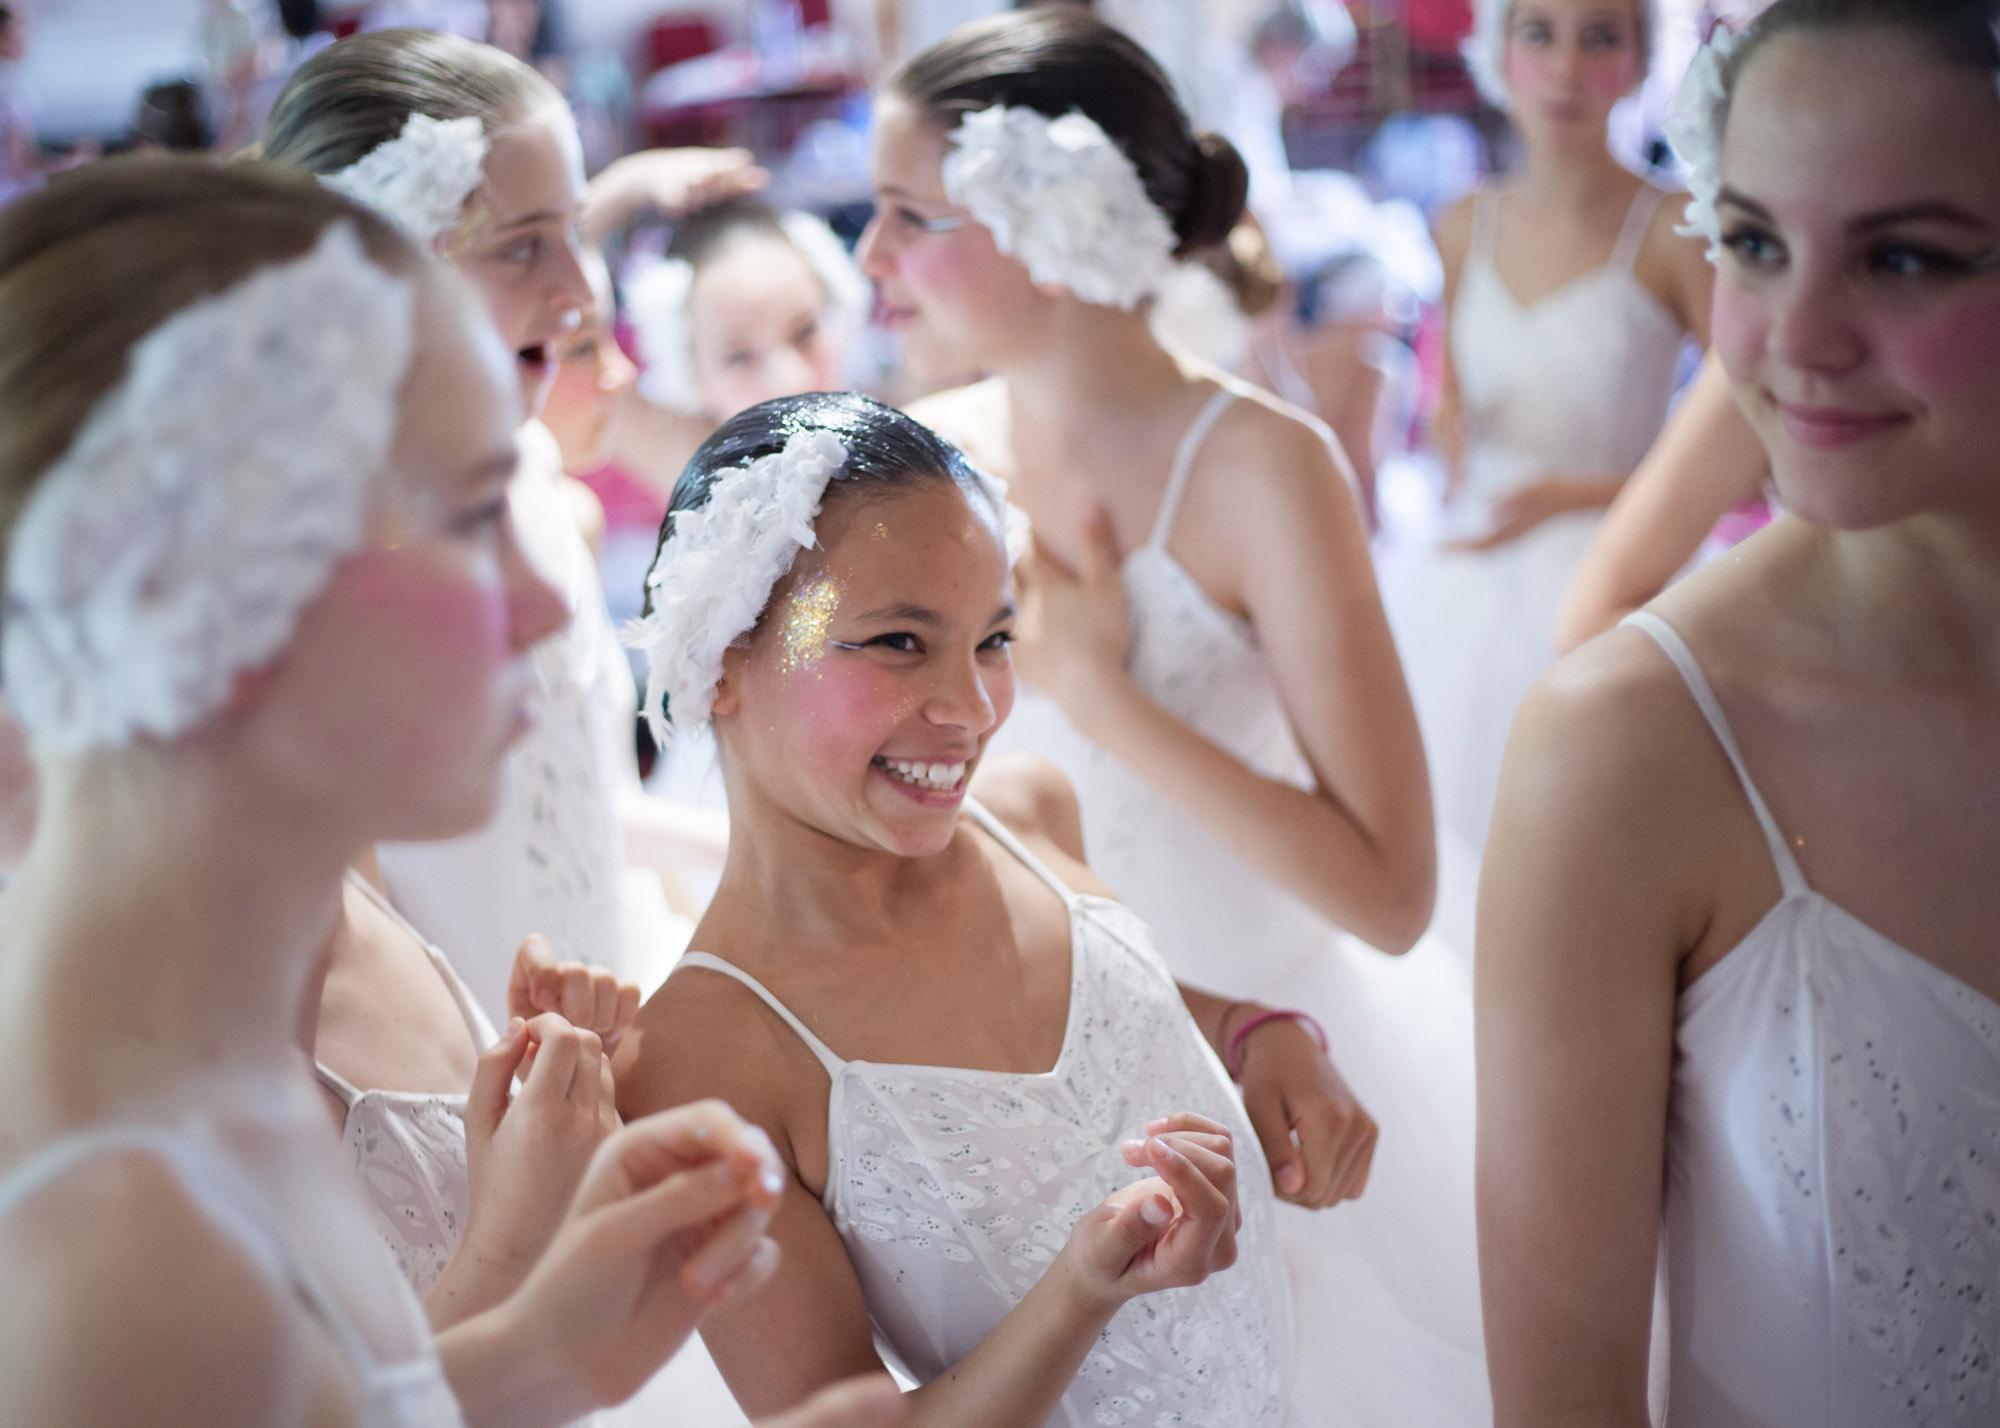 Ballet School London Show Swan Lake 4.jpg